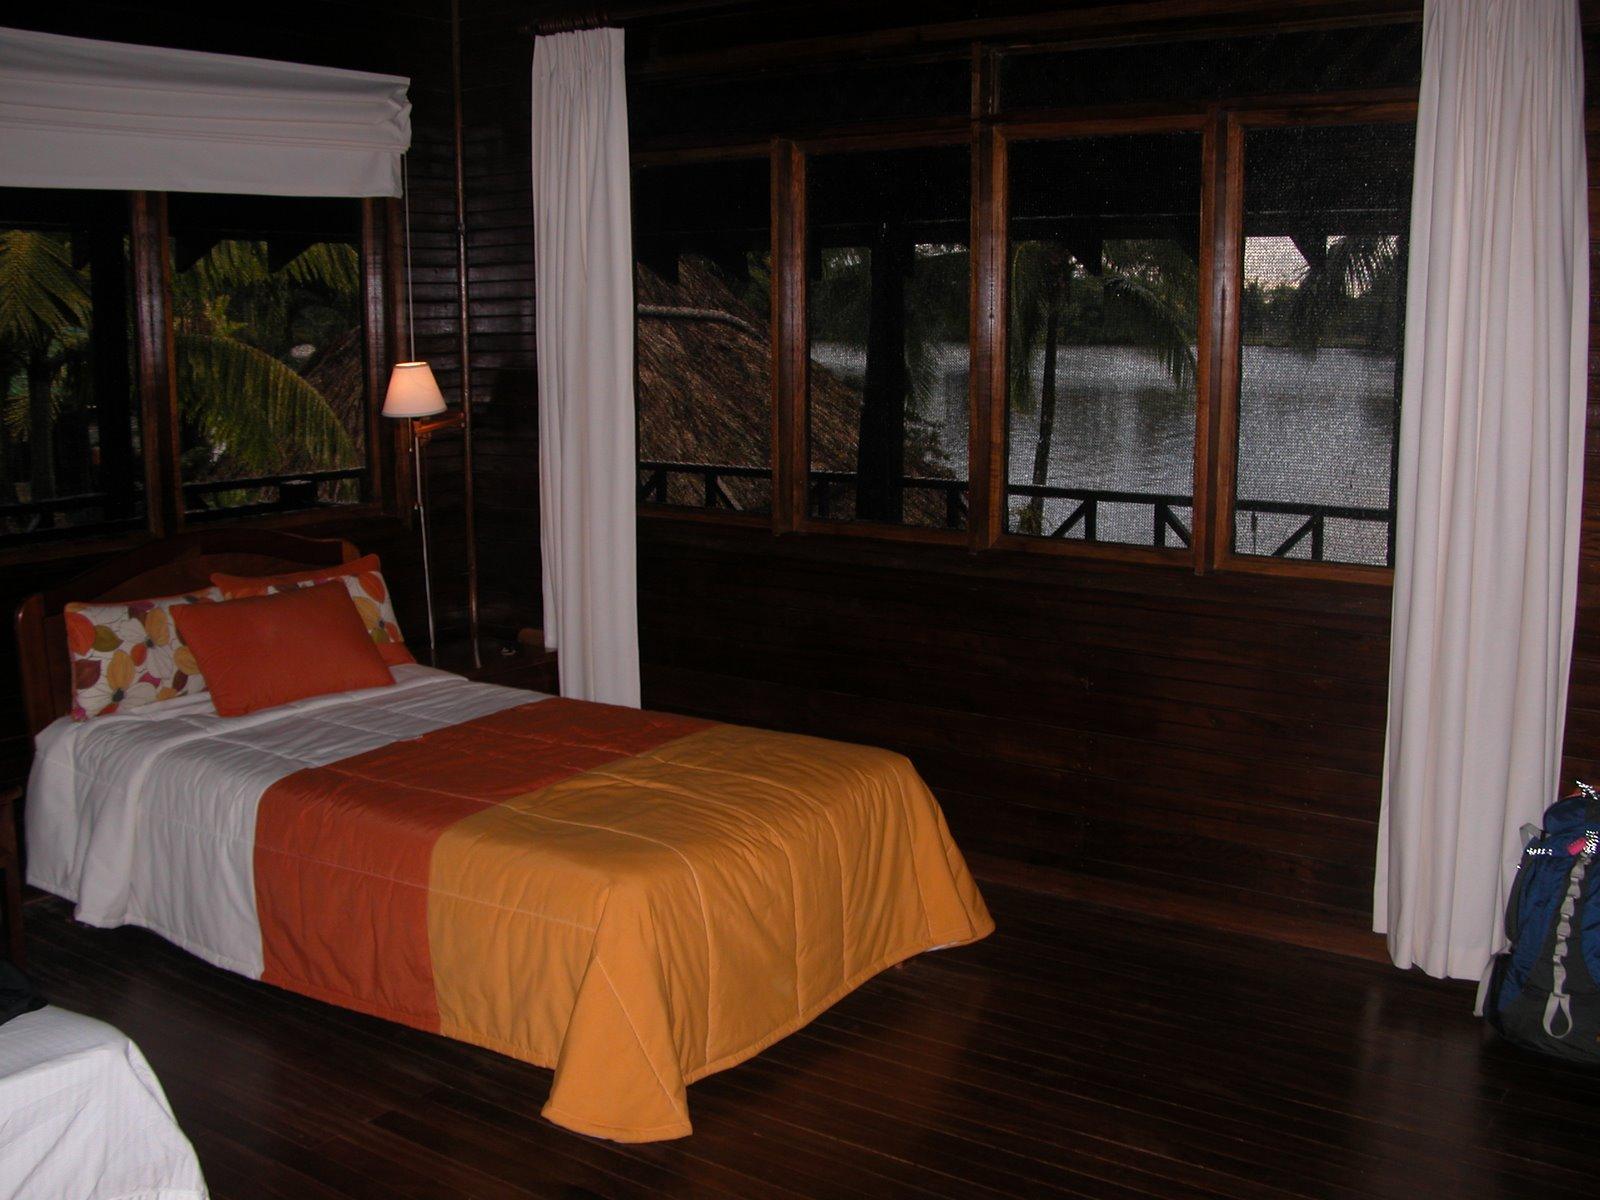 [09-3-23+Tortuguero+Lodge+room+0381A+DSCN6466.JPG]